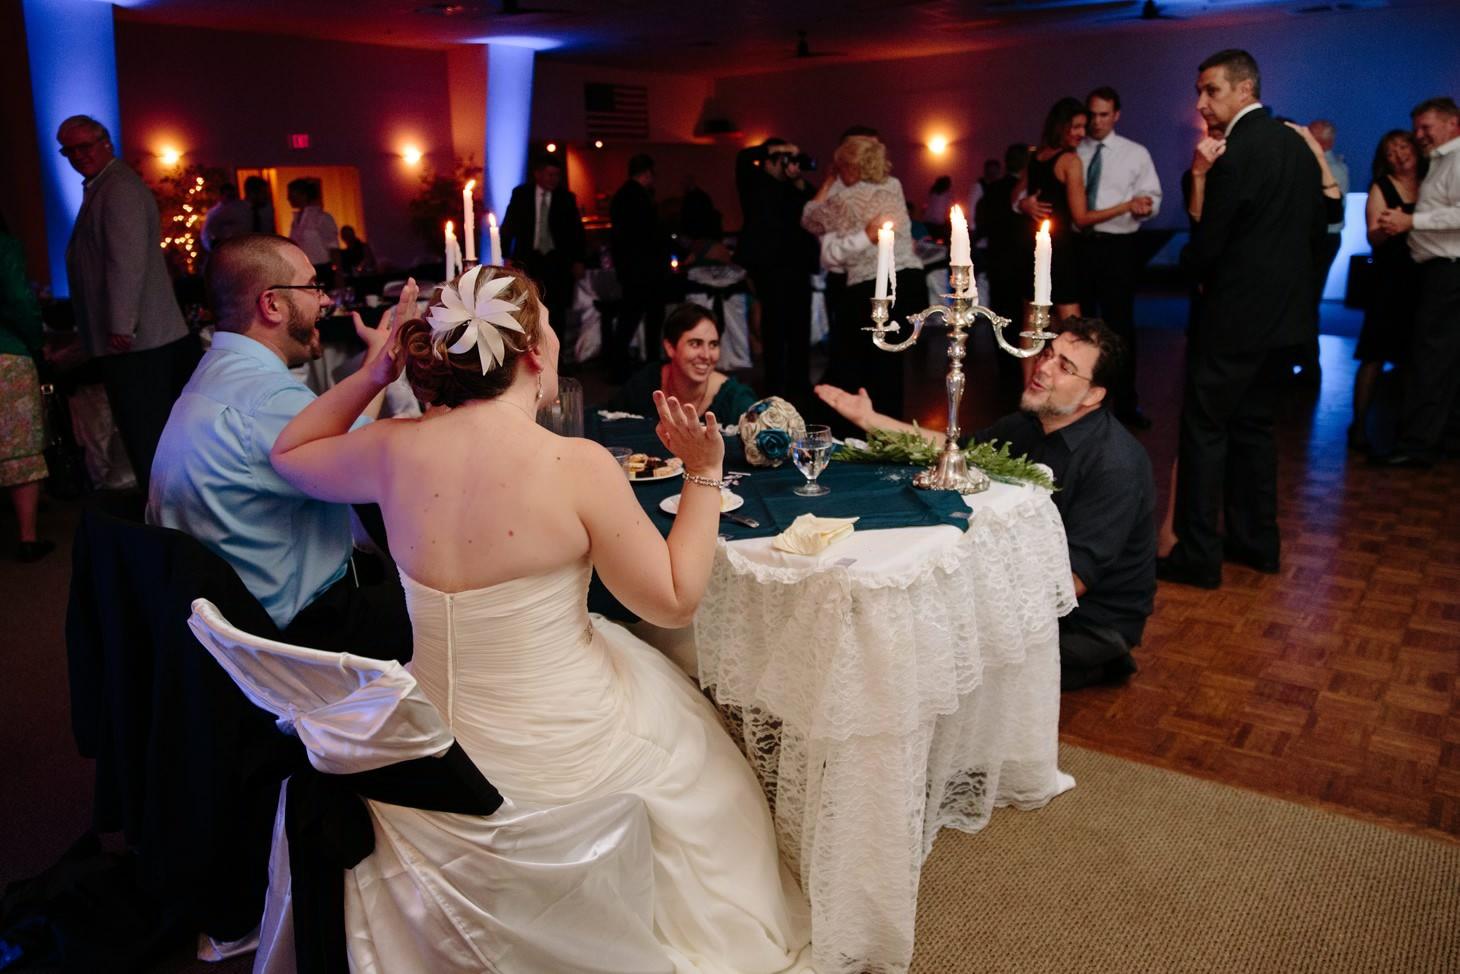 061-nyc-wedding-photographer-nj-nerdy-dr-who-firehouse-wedding-smitten-chickens.jpg